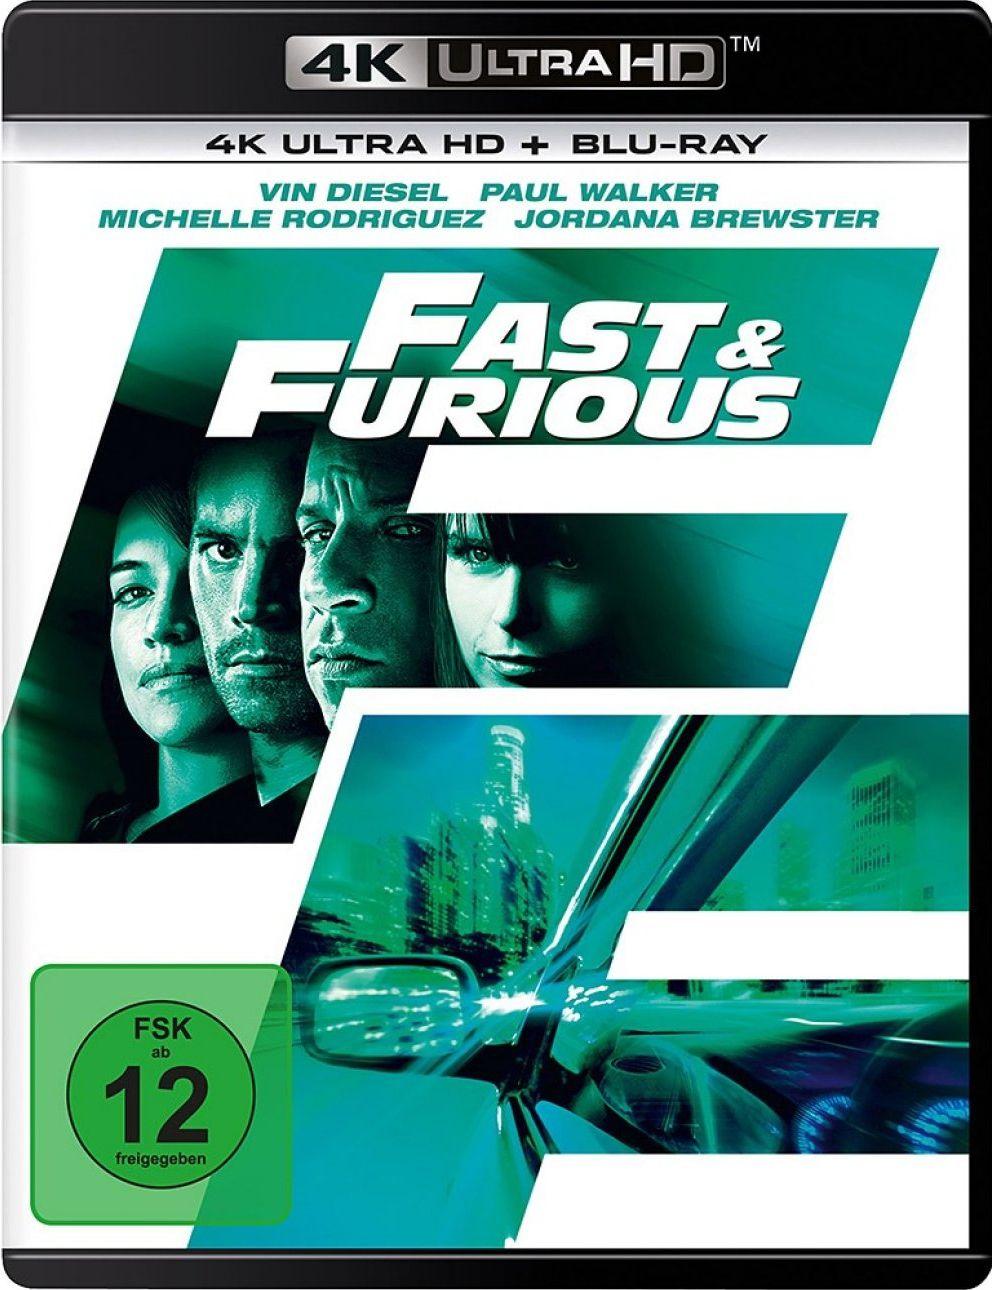 Fast & Furious - Neues Modell. Originalteile. (2 Discs) (UHD BLURAY + BLURAY)